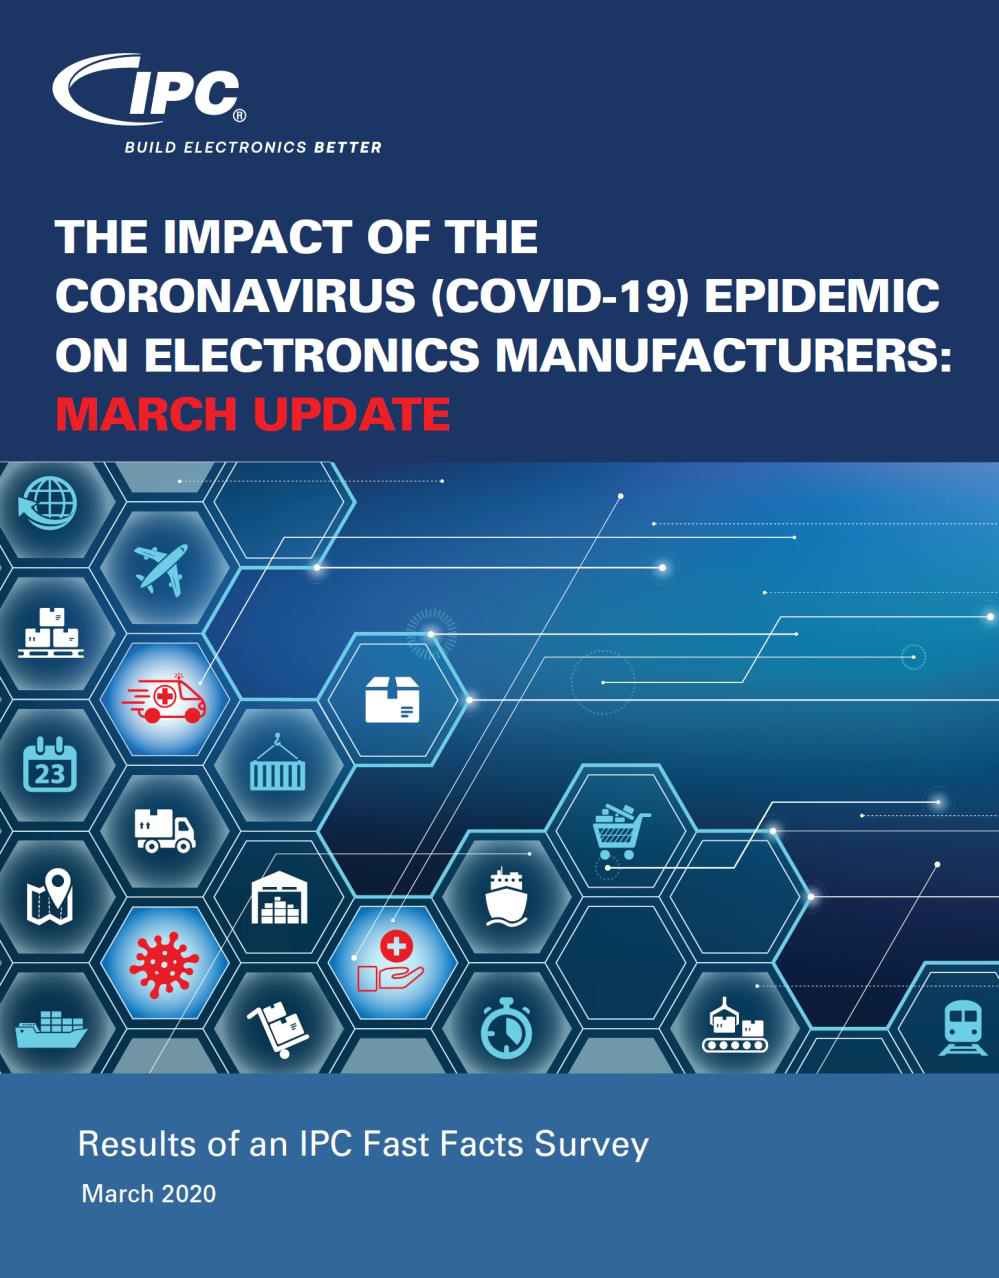 IPC发布新型冠状病毒对电子产品制造商的影响